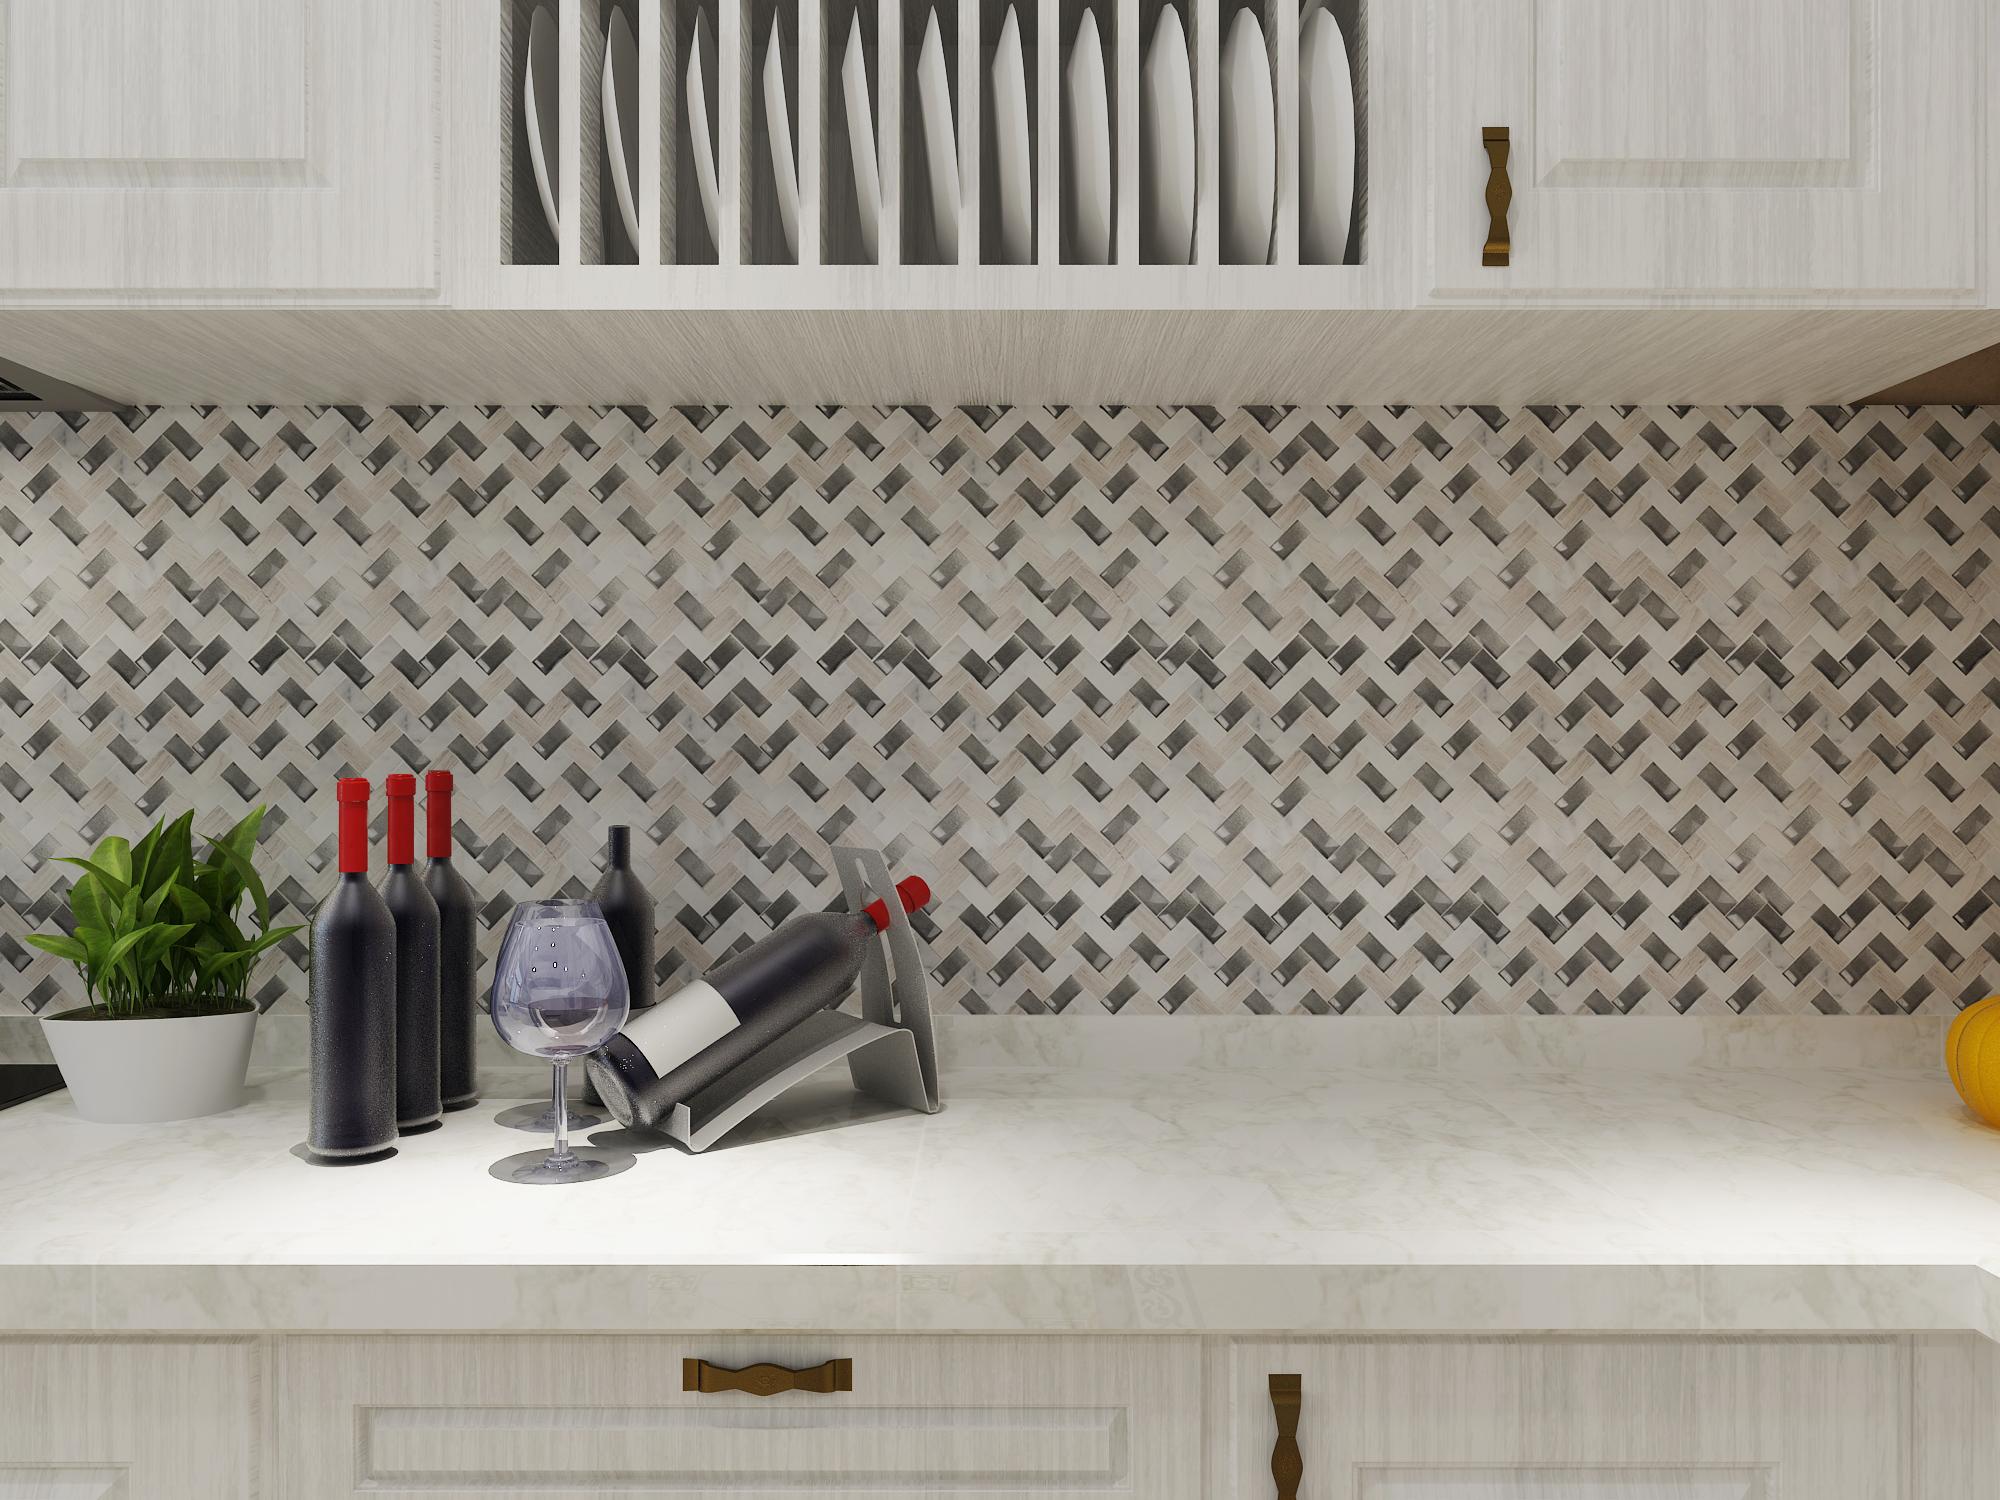 3d-centurymosaic-basketweave-marble-mosaic-tile-wholesale (5)